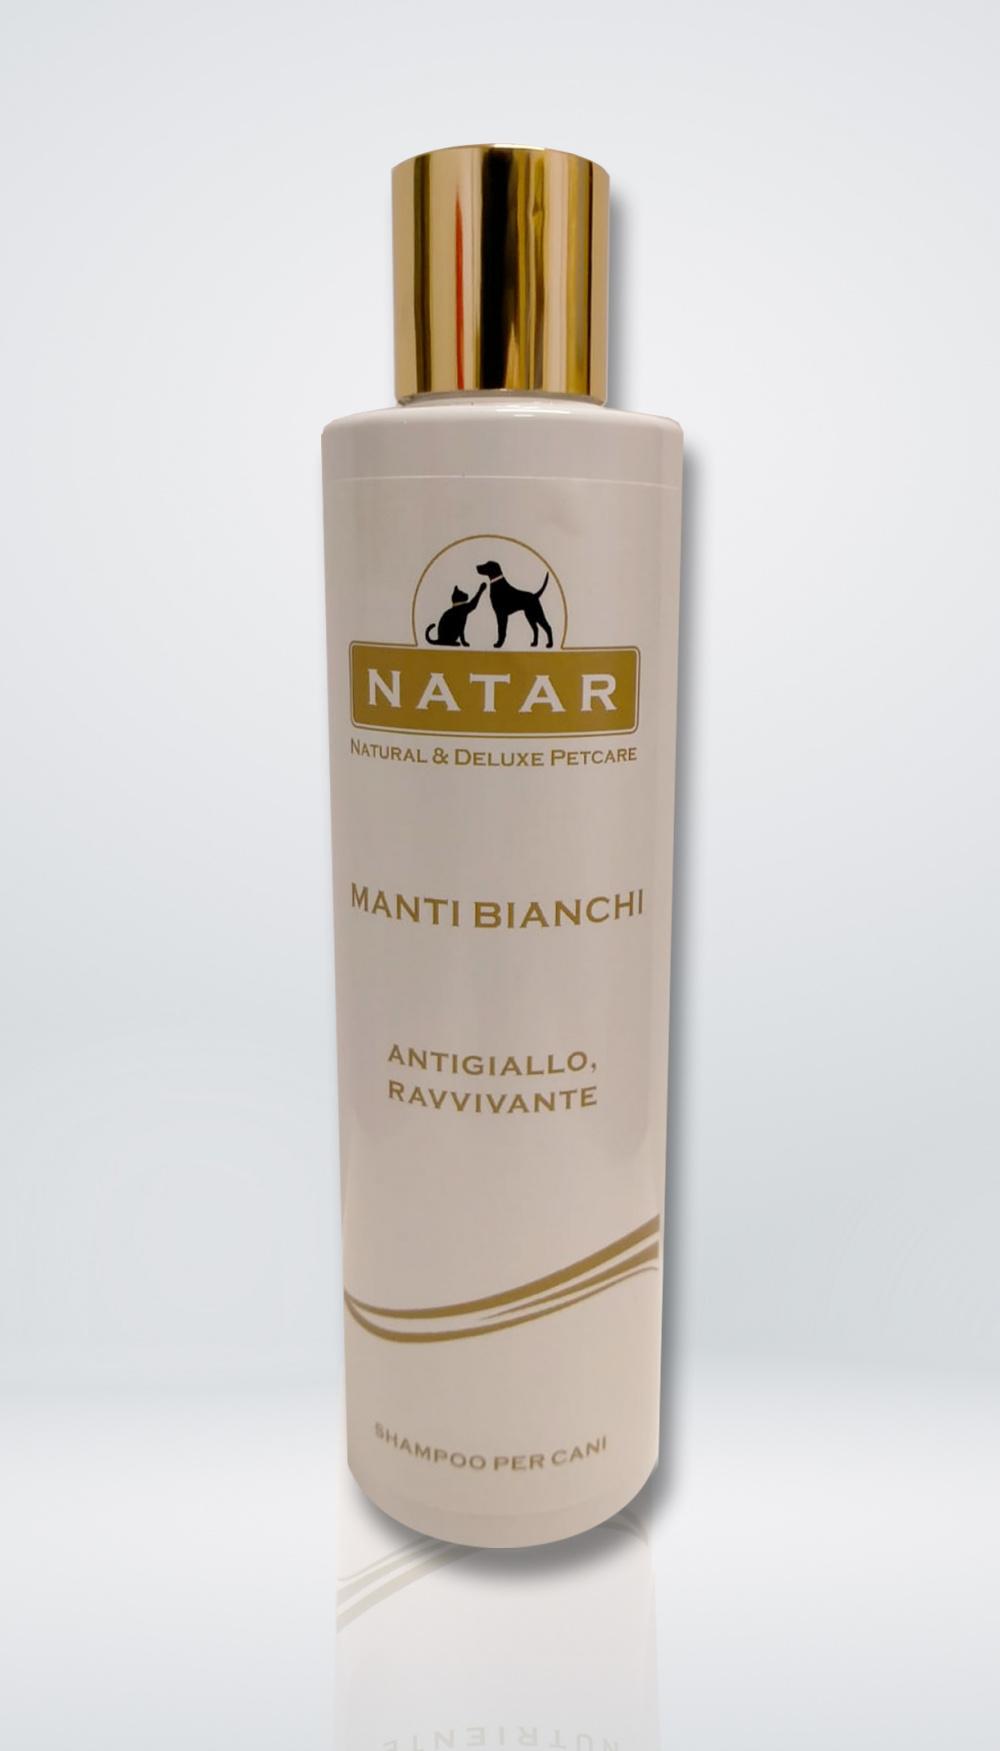 Natar Shampoo per Cani Manti Bianchi